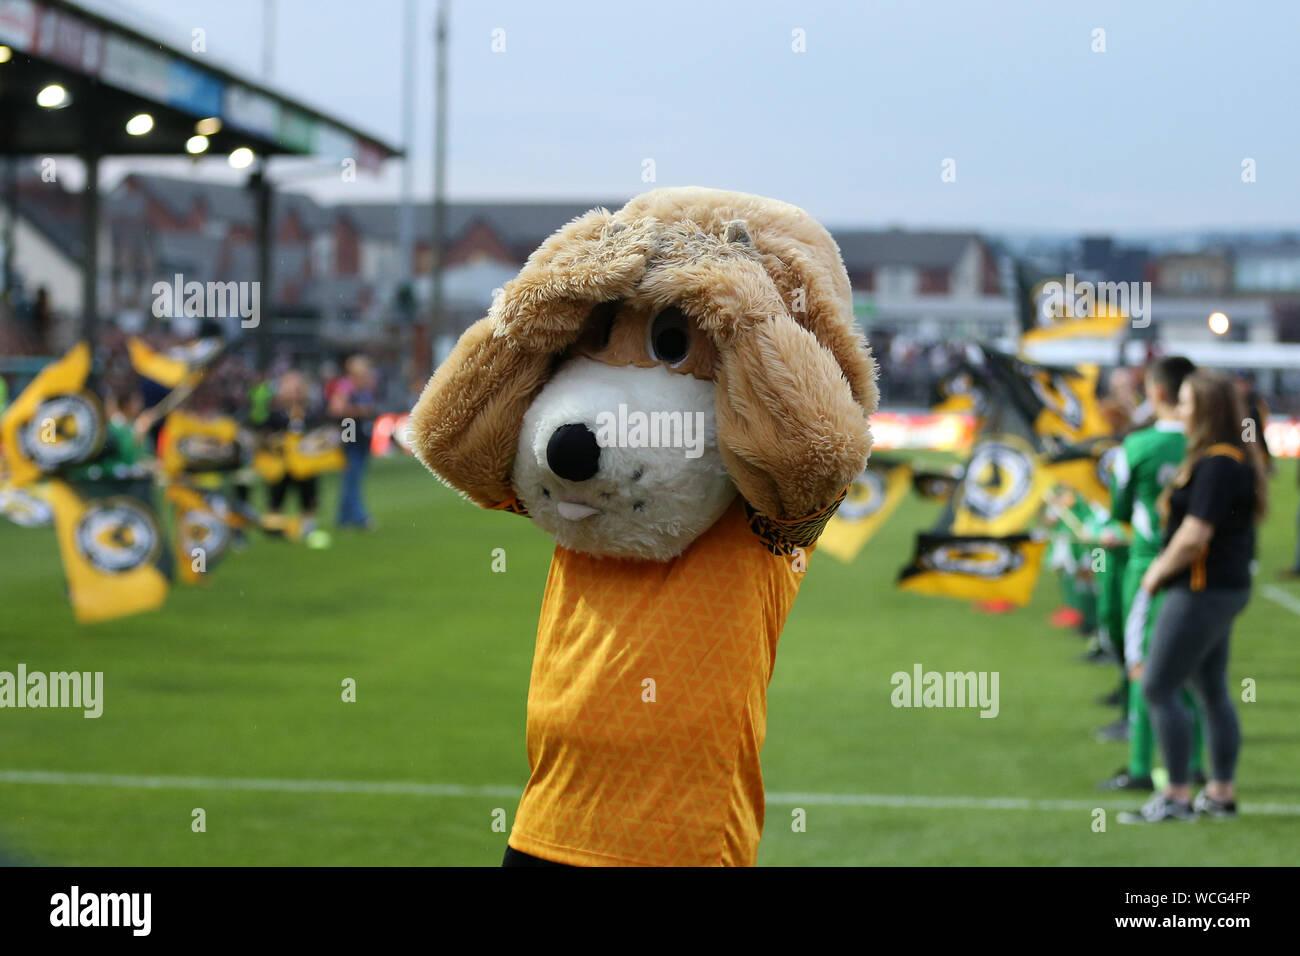 Newport Uk 27th Aug 2019 Newport County Mascot Spytty